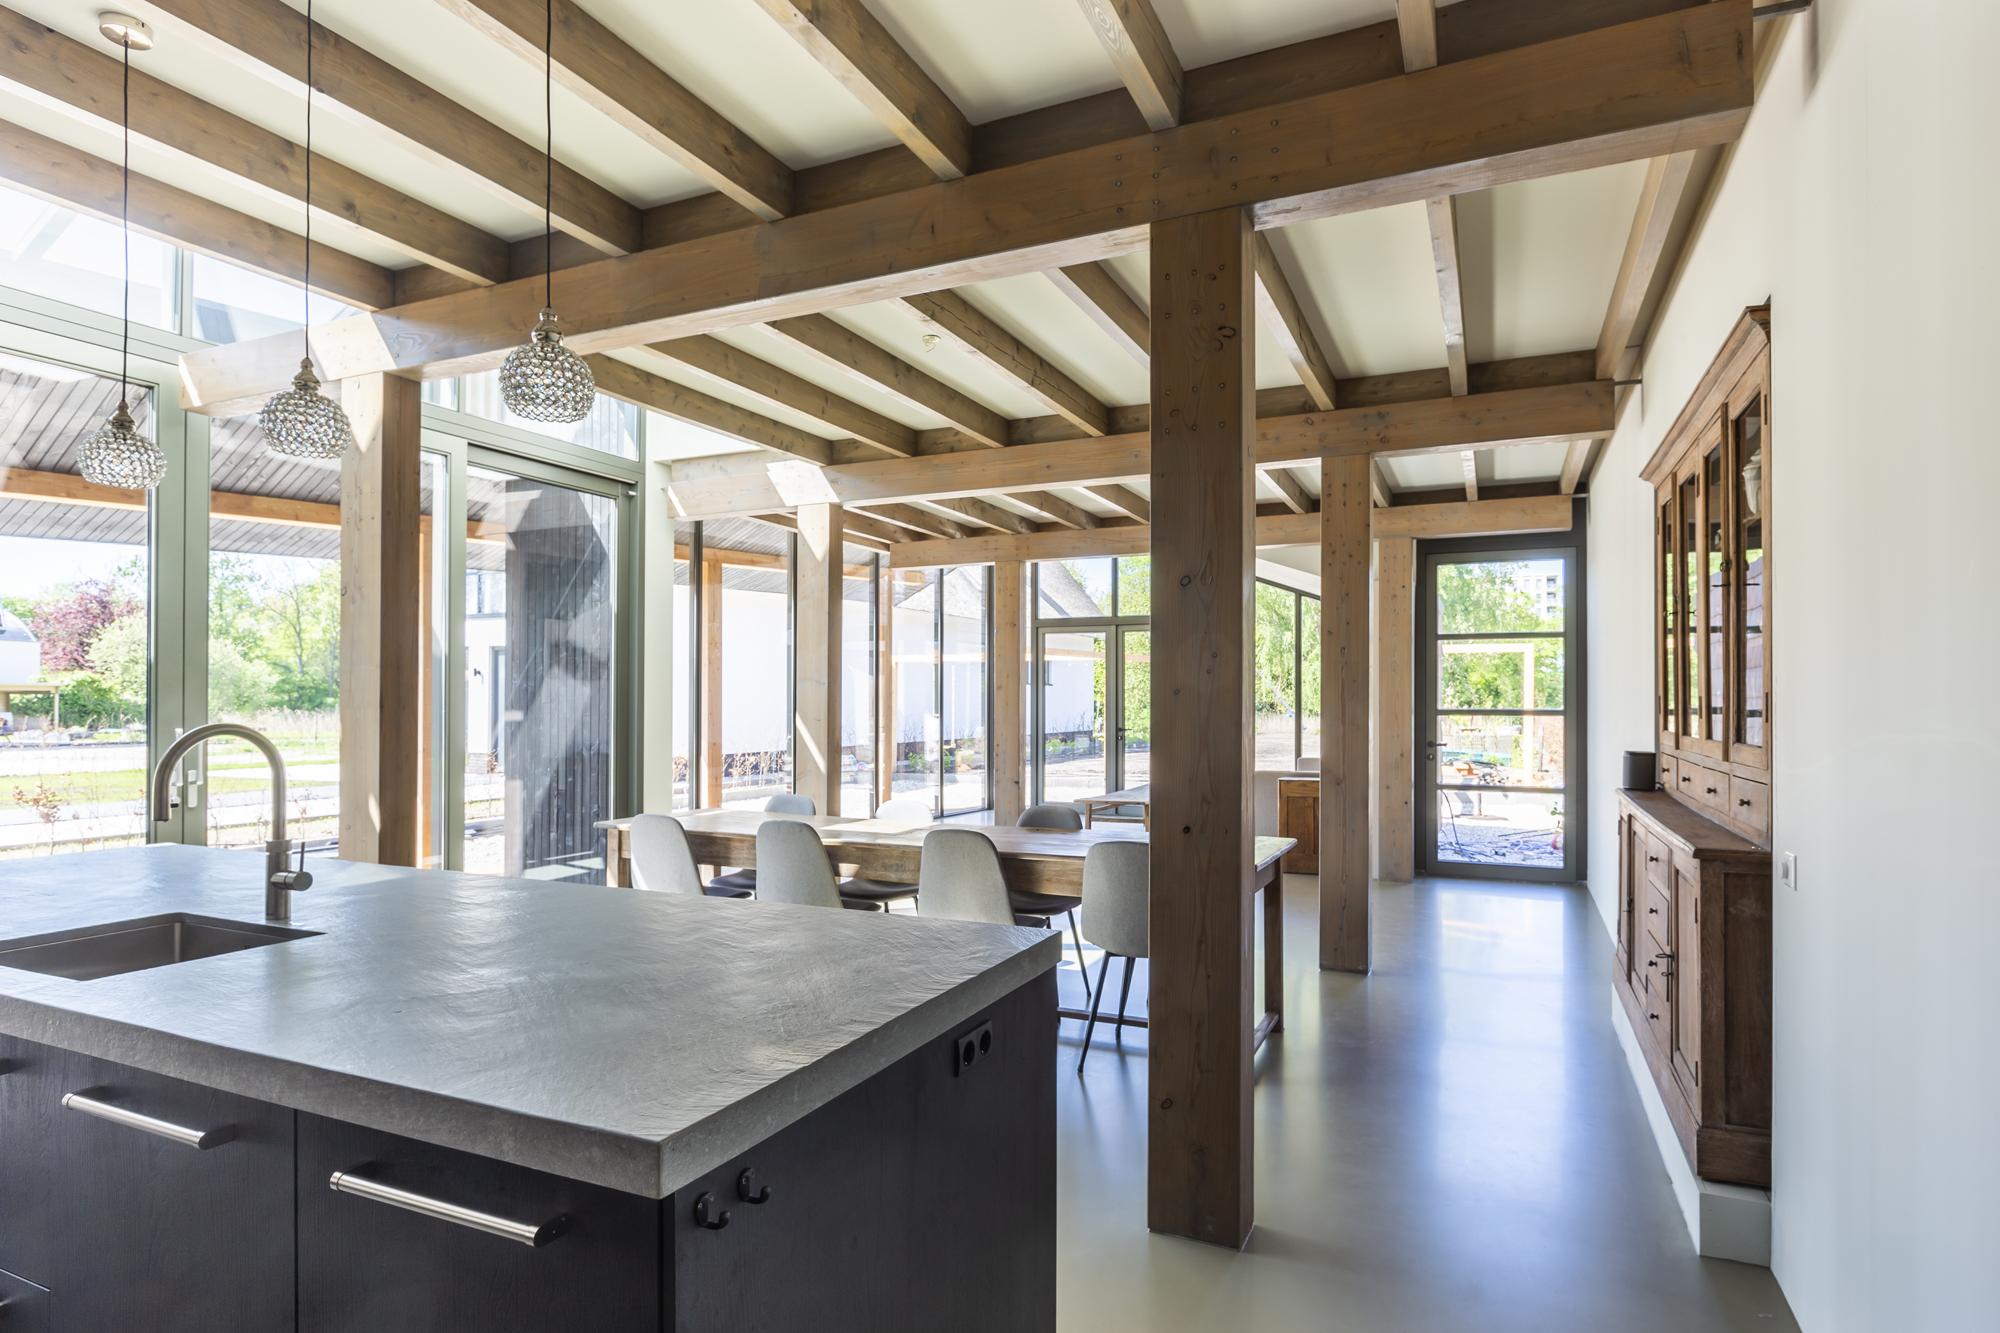 BOON ARCHITECTUUR-LONG HOUSE-2013-HDR_LR